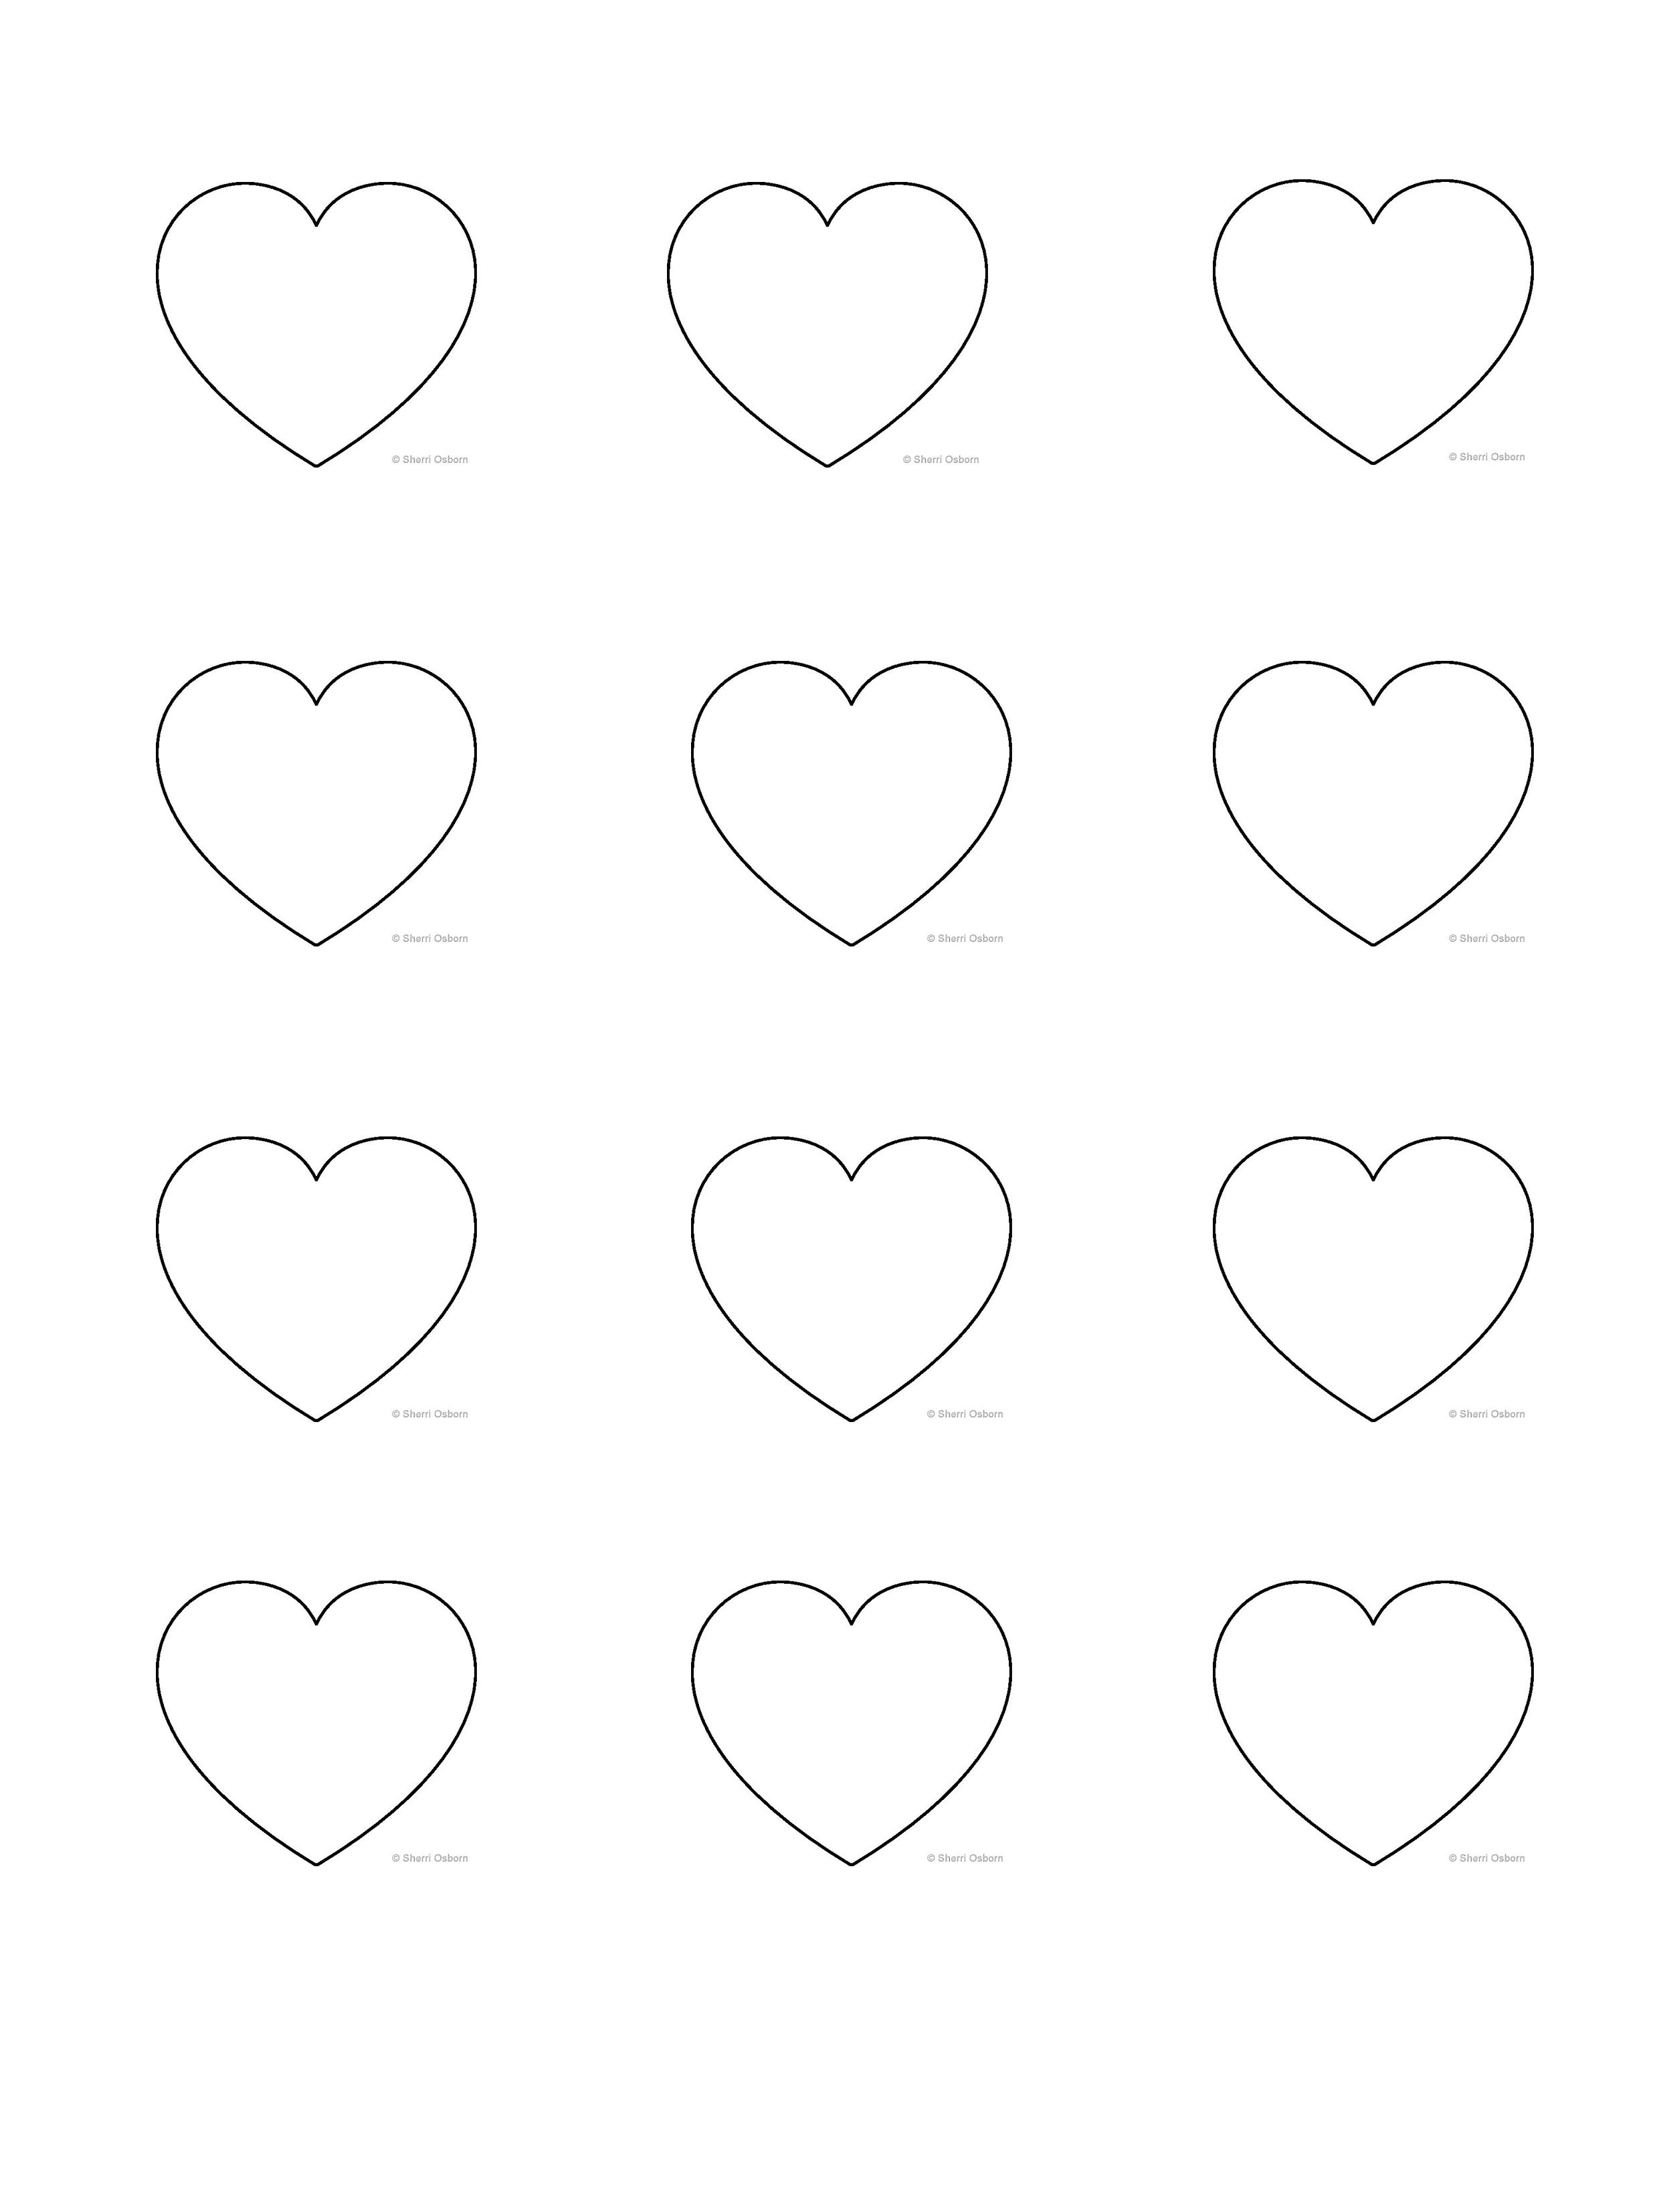 Heart Shape Template 3 8cm